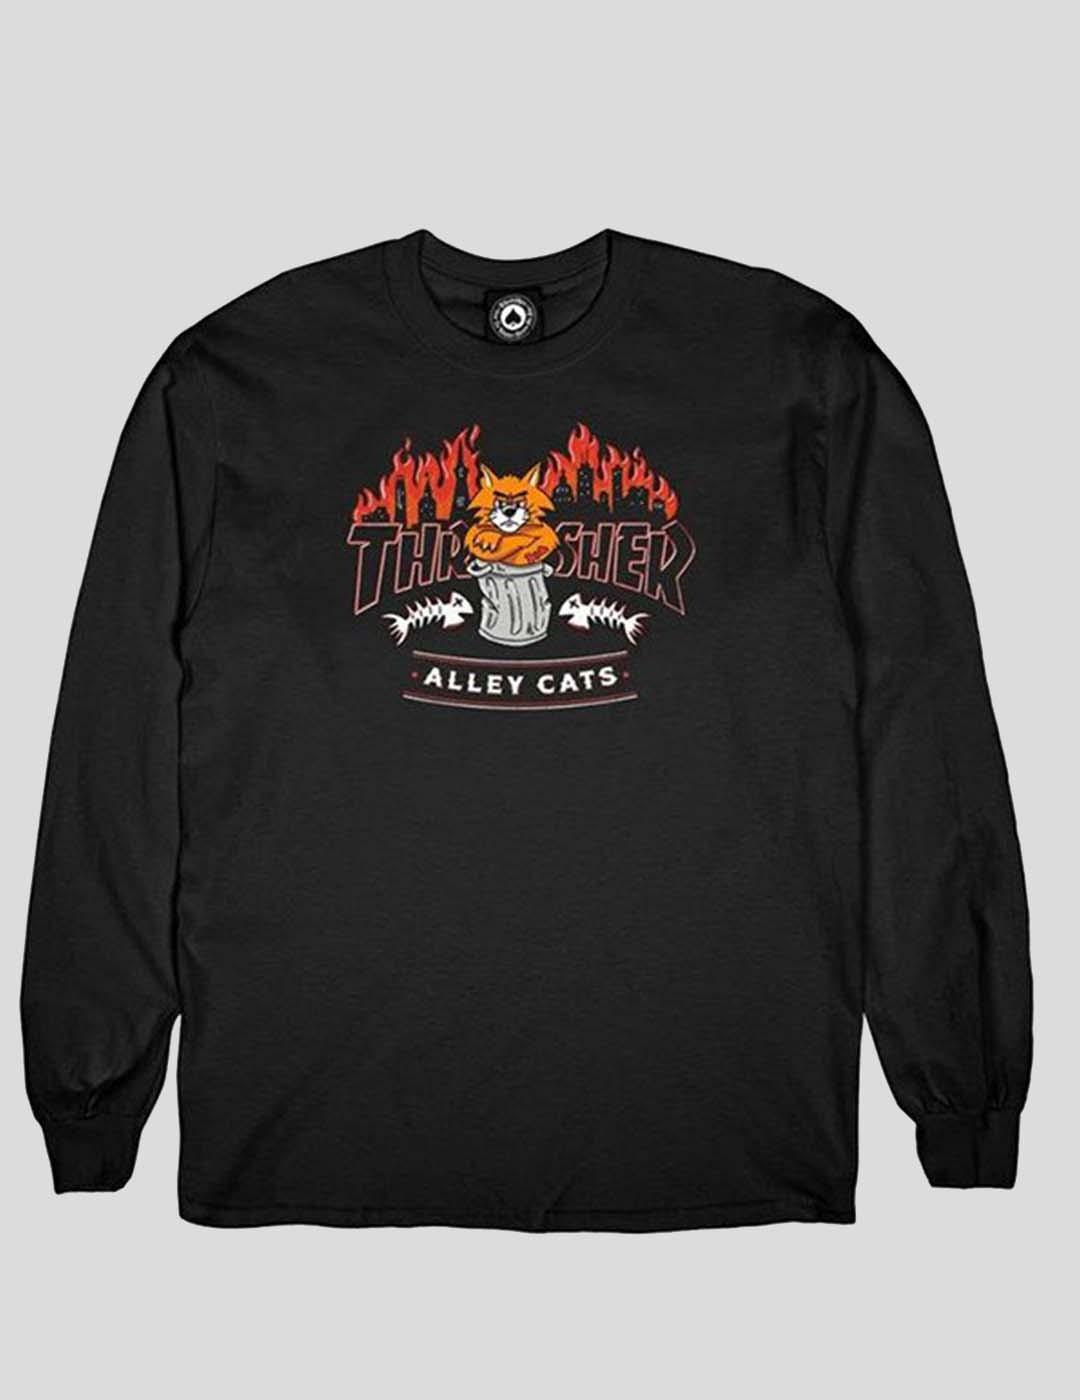 CAMISETA THRASHER ALLEY CATS LONG SLEEVE TEE BLACK